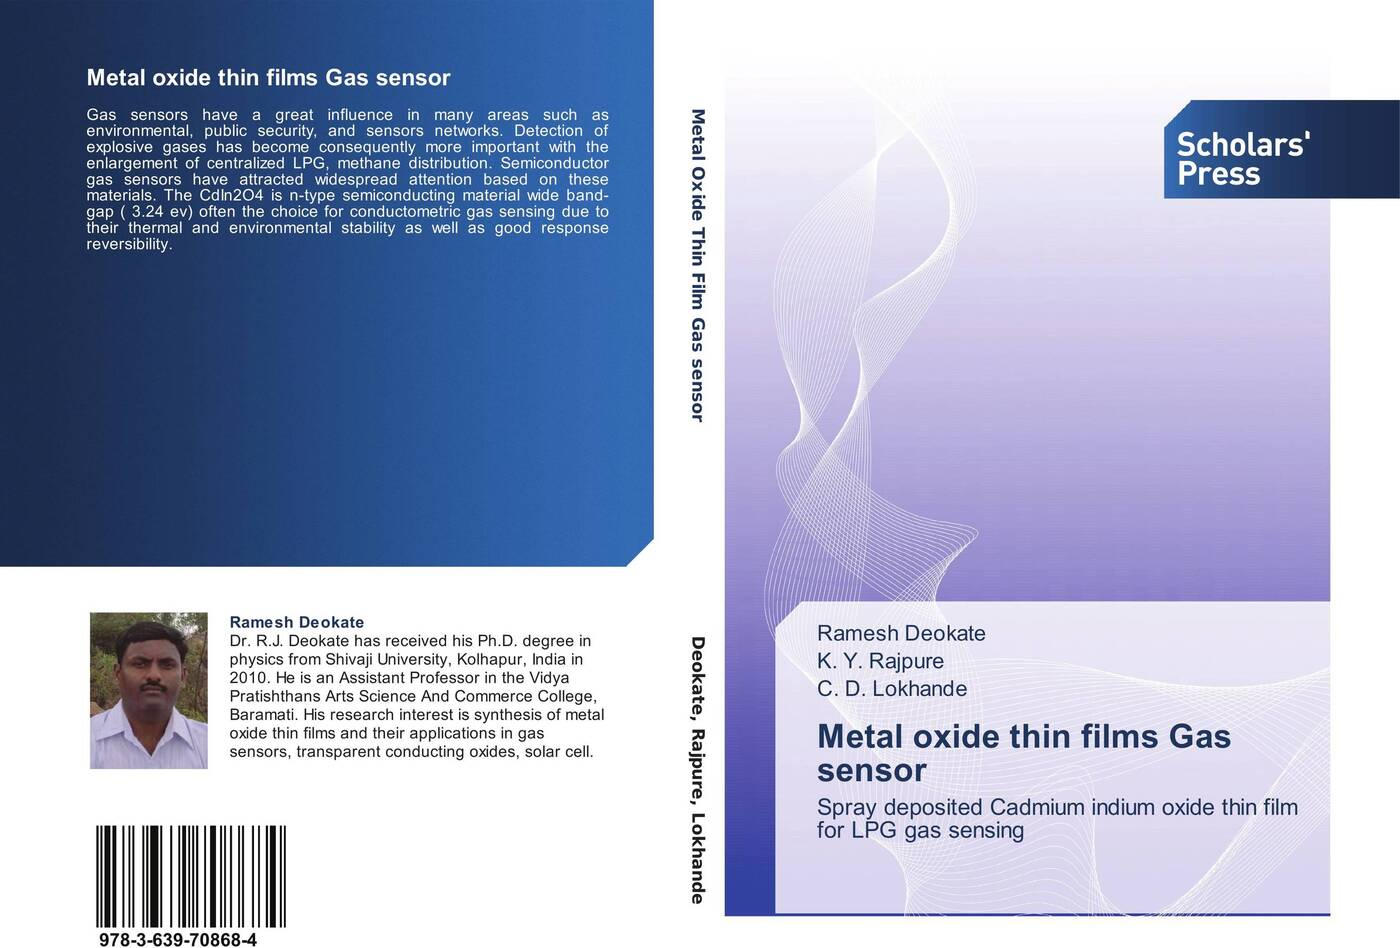 Ramesh Deokate,K. Y. Rajpure and C. D. Lokhande Metal oxide thin films Gas sensor